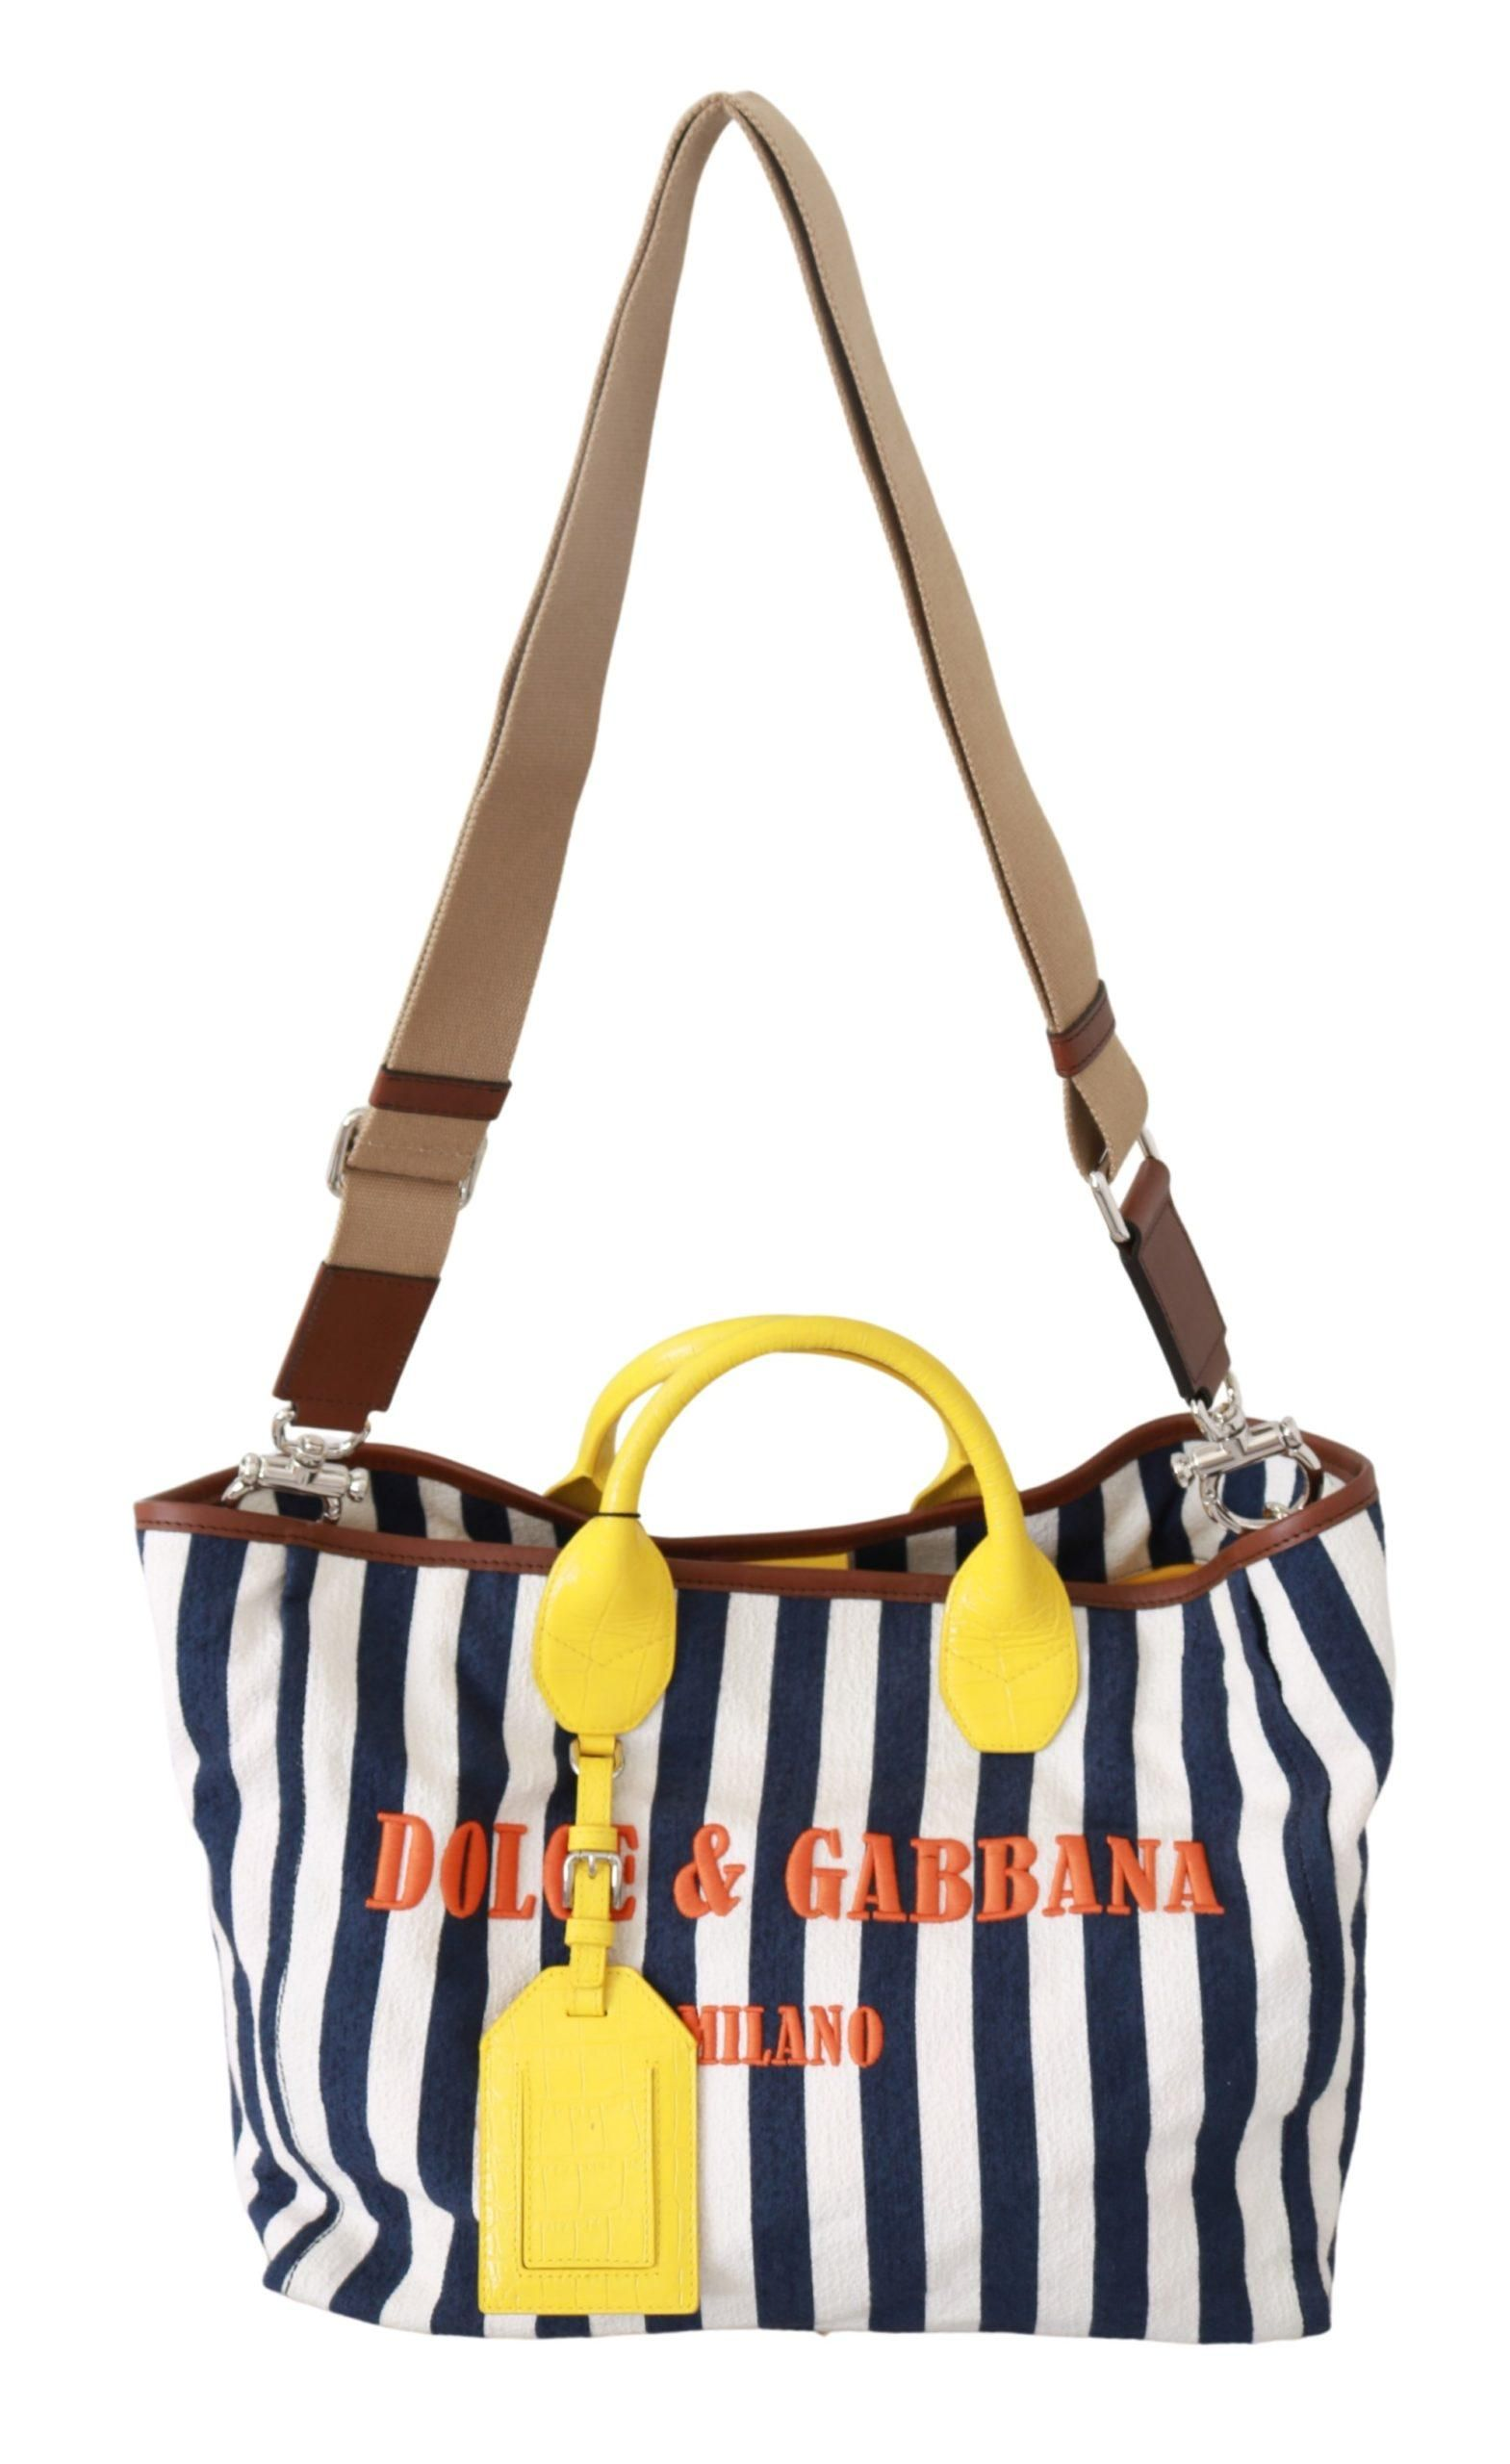 Blue White Striped Shopping Borse Women Tote Cotton Bag